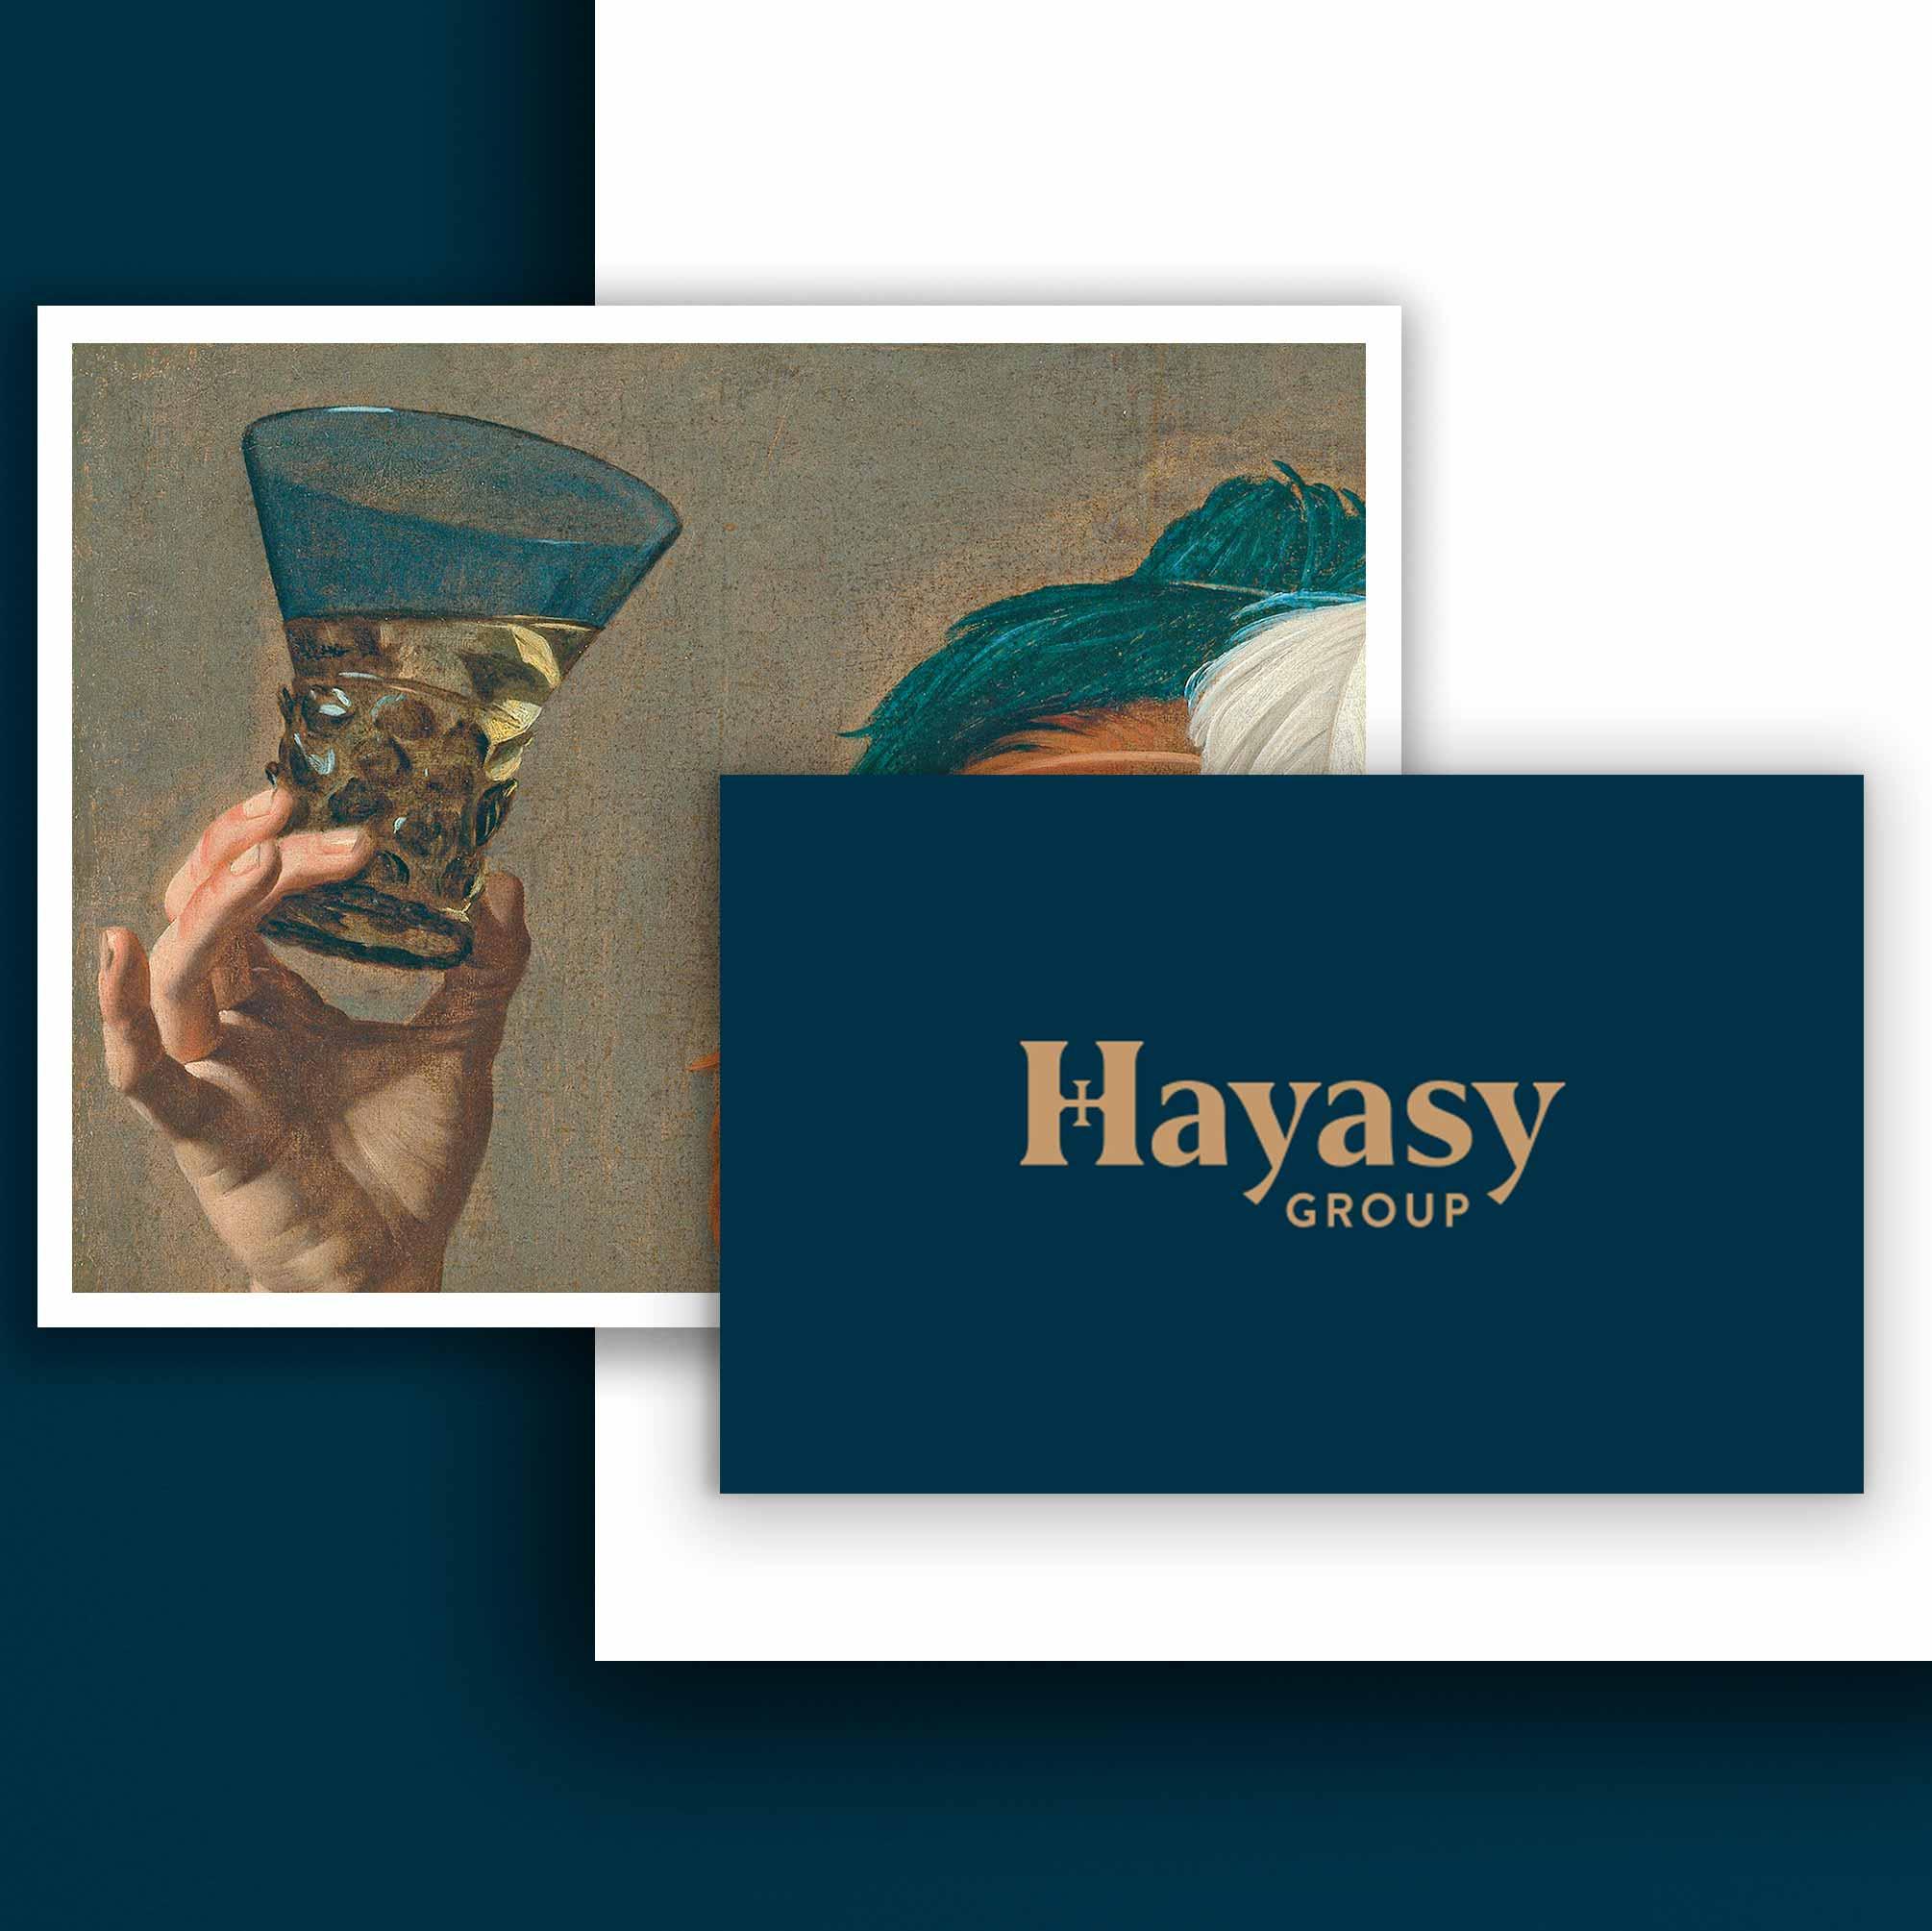 Hayasy Group